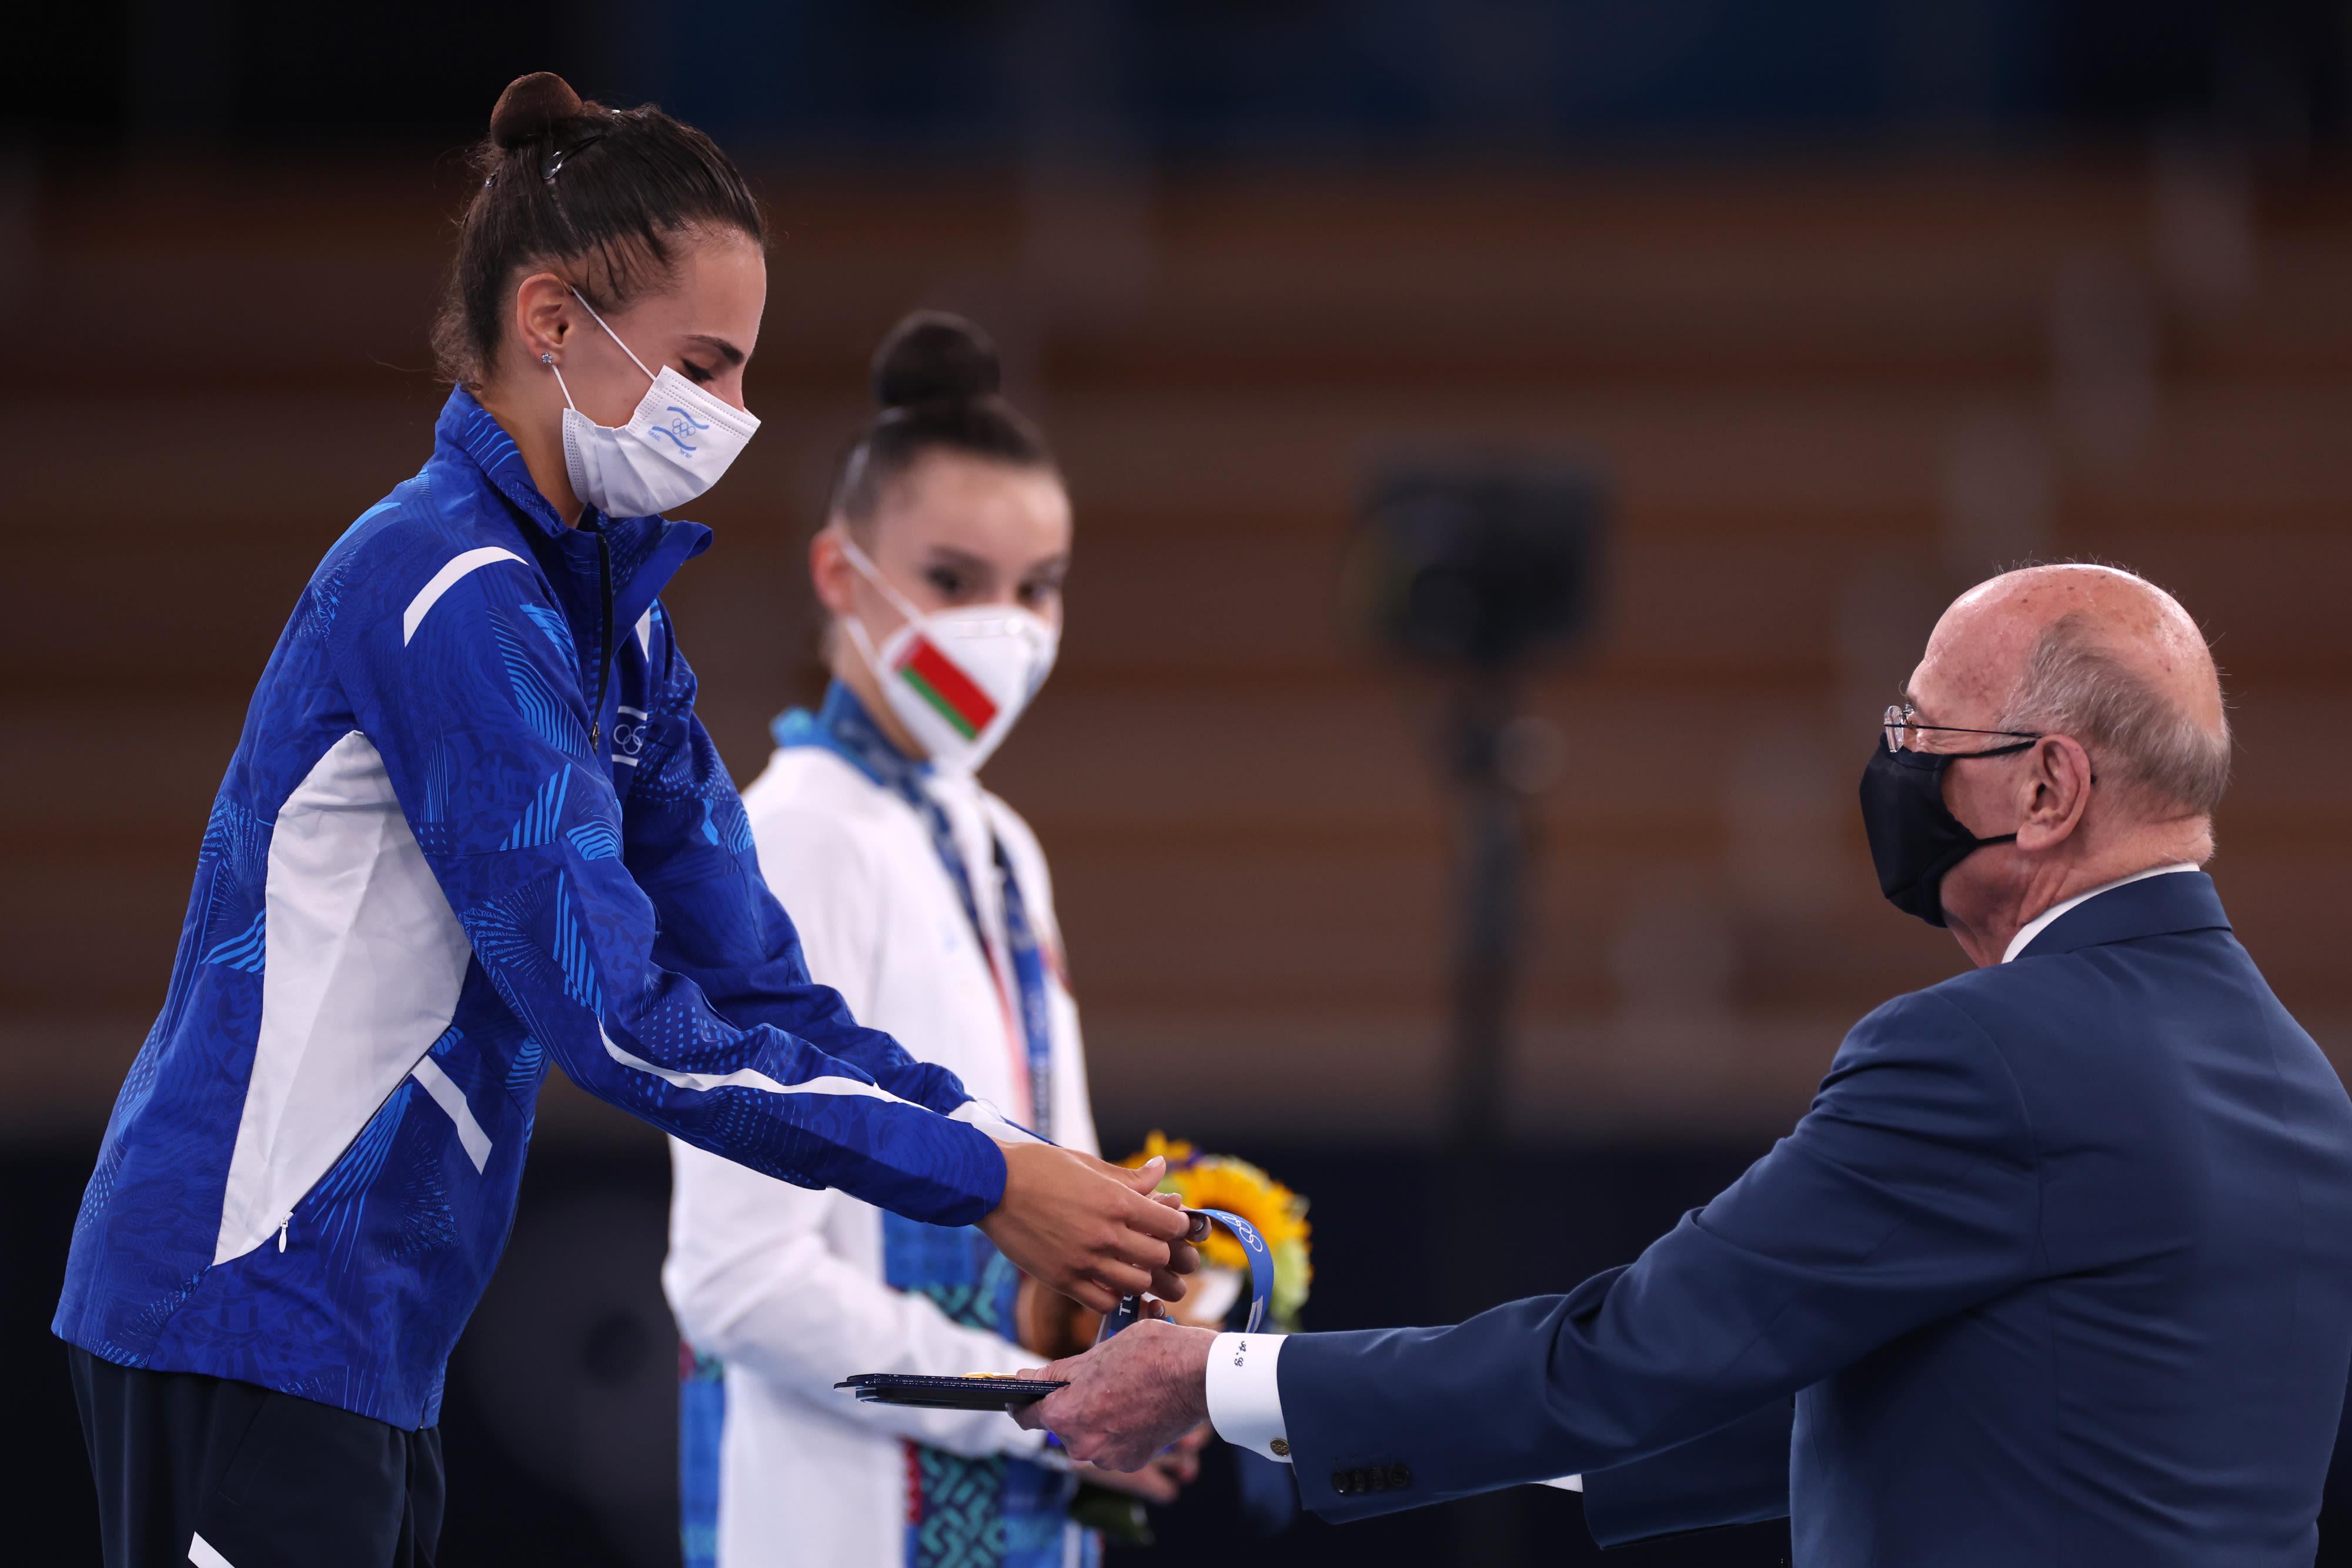 Linoy Ashram, an Israeli artistic gymnast, receives a gold medal from Alex Giladi